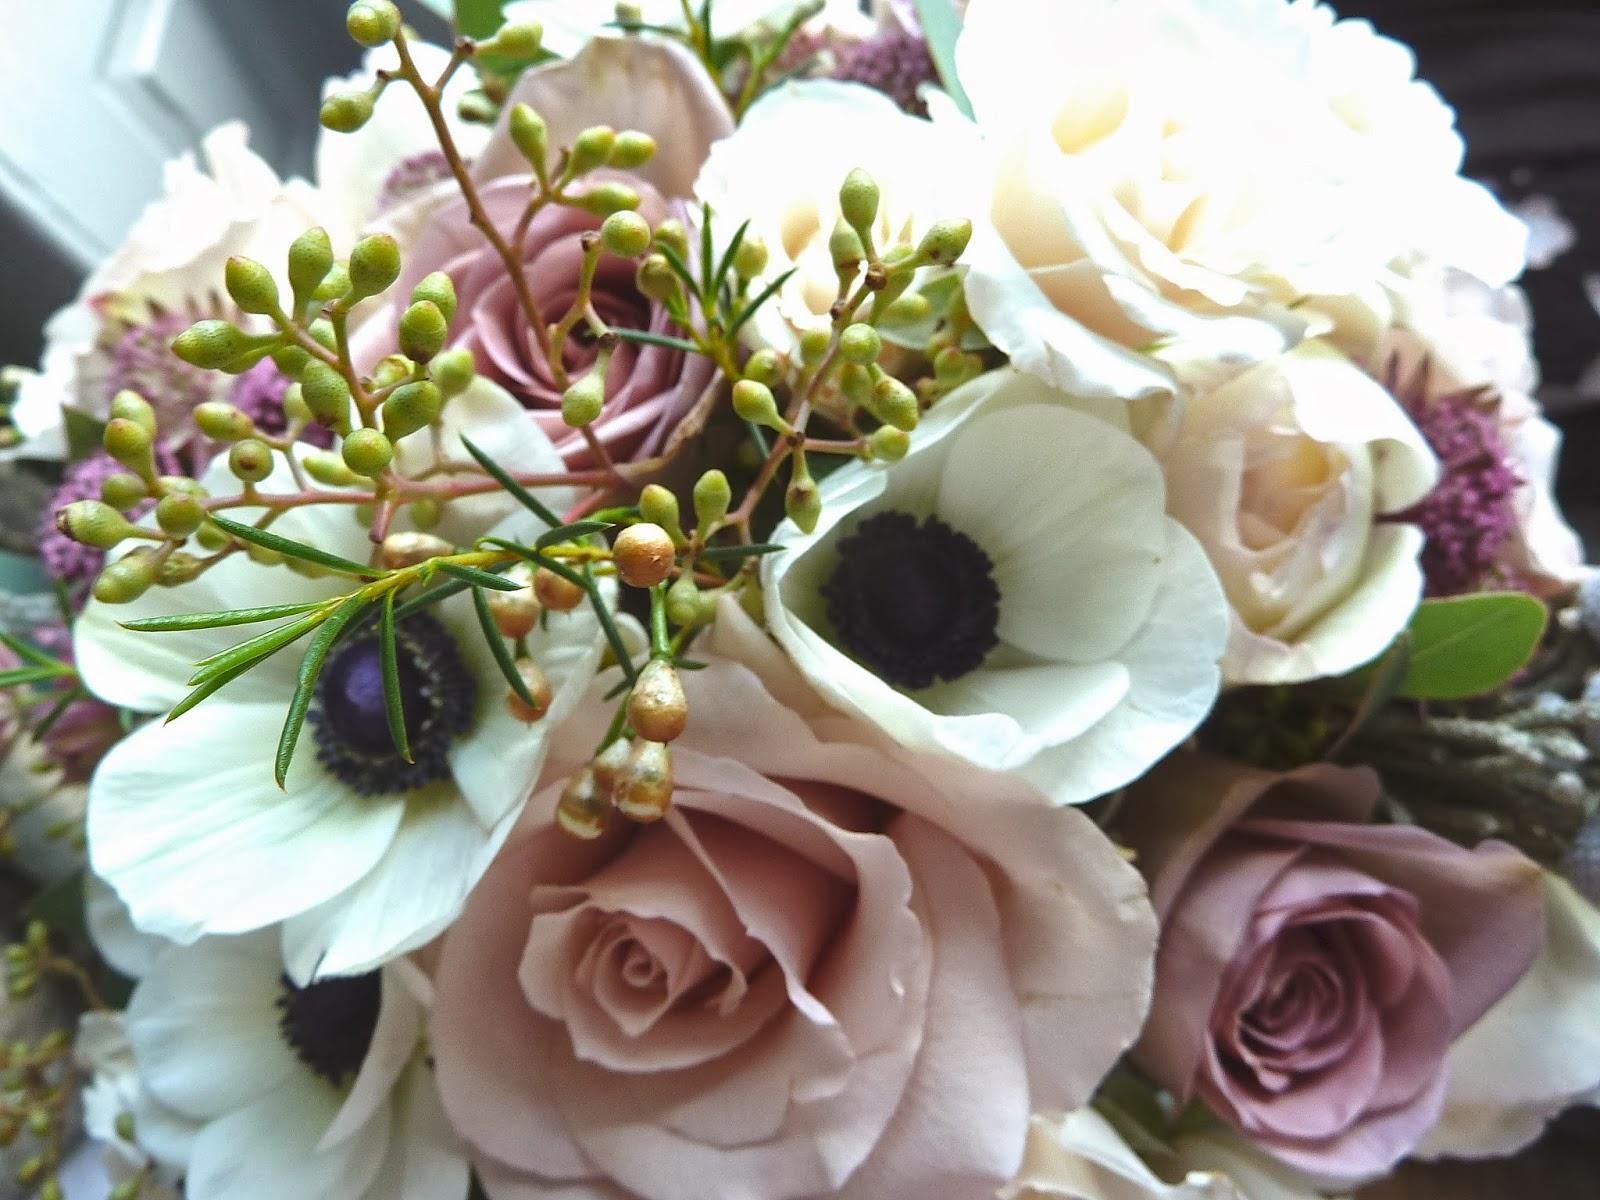 88 February Wedding Flowers February Wedding Flowers Uk